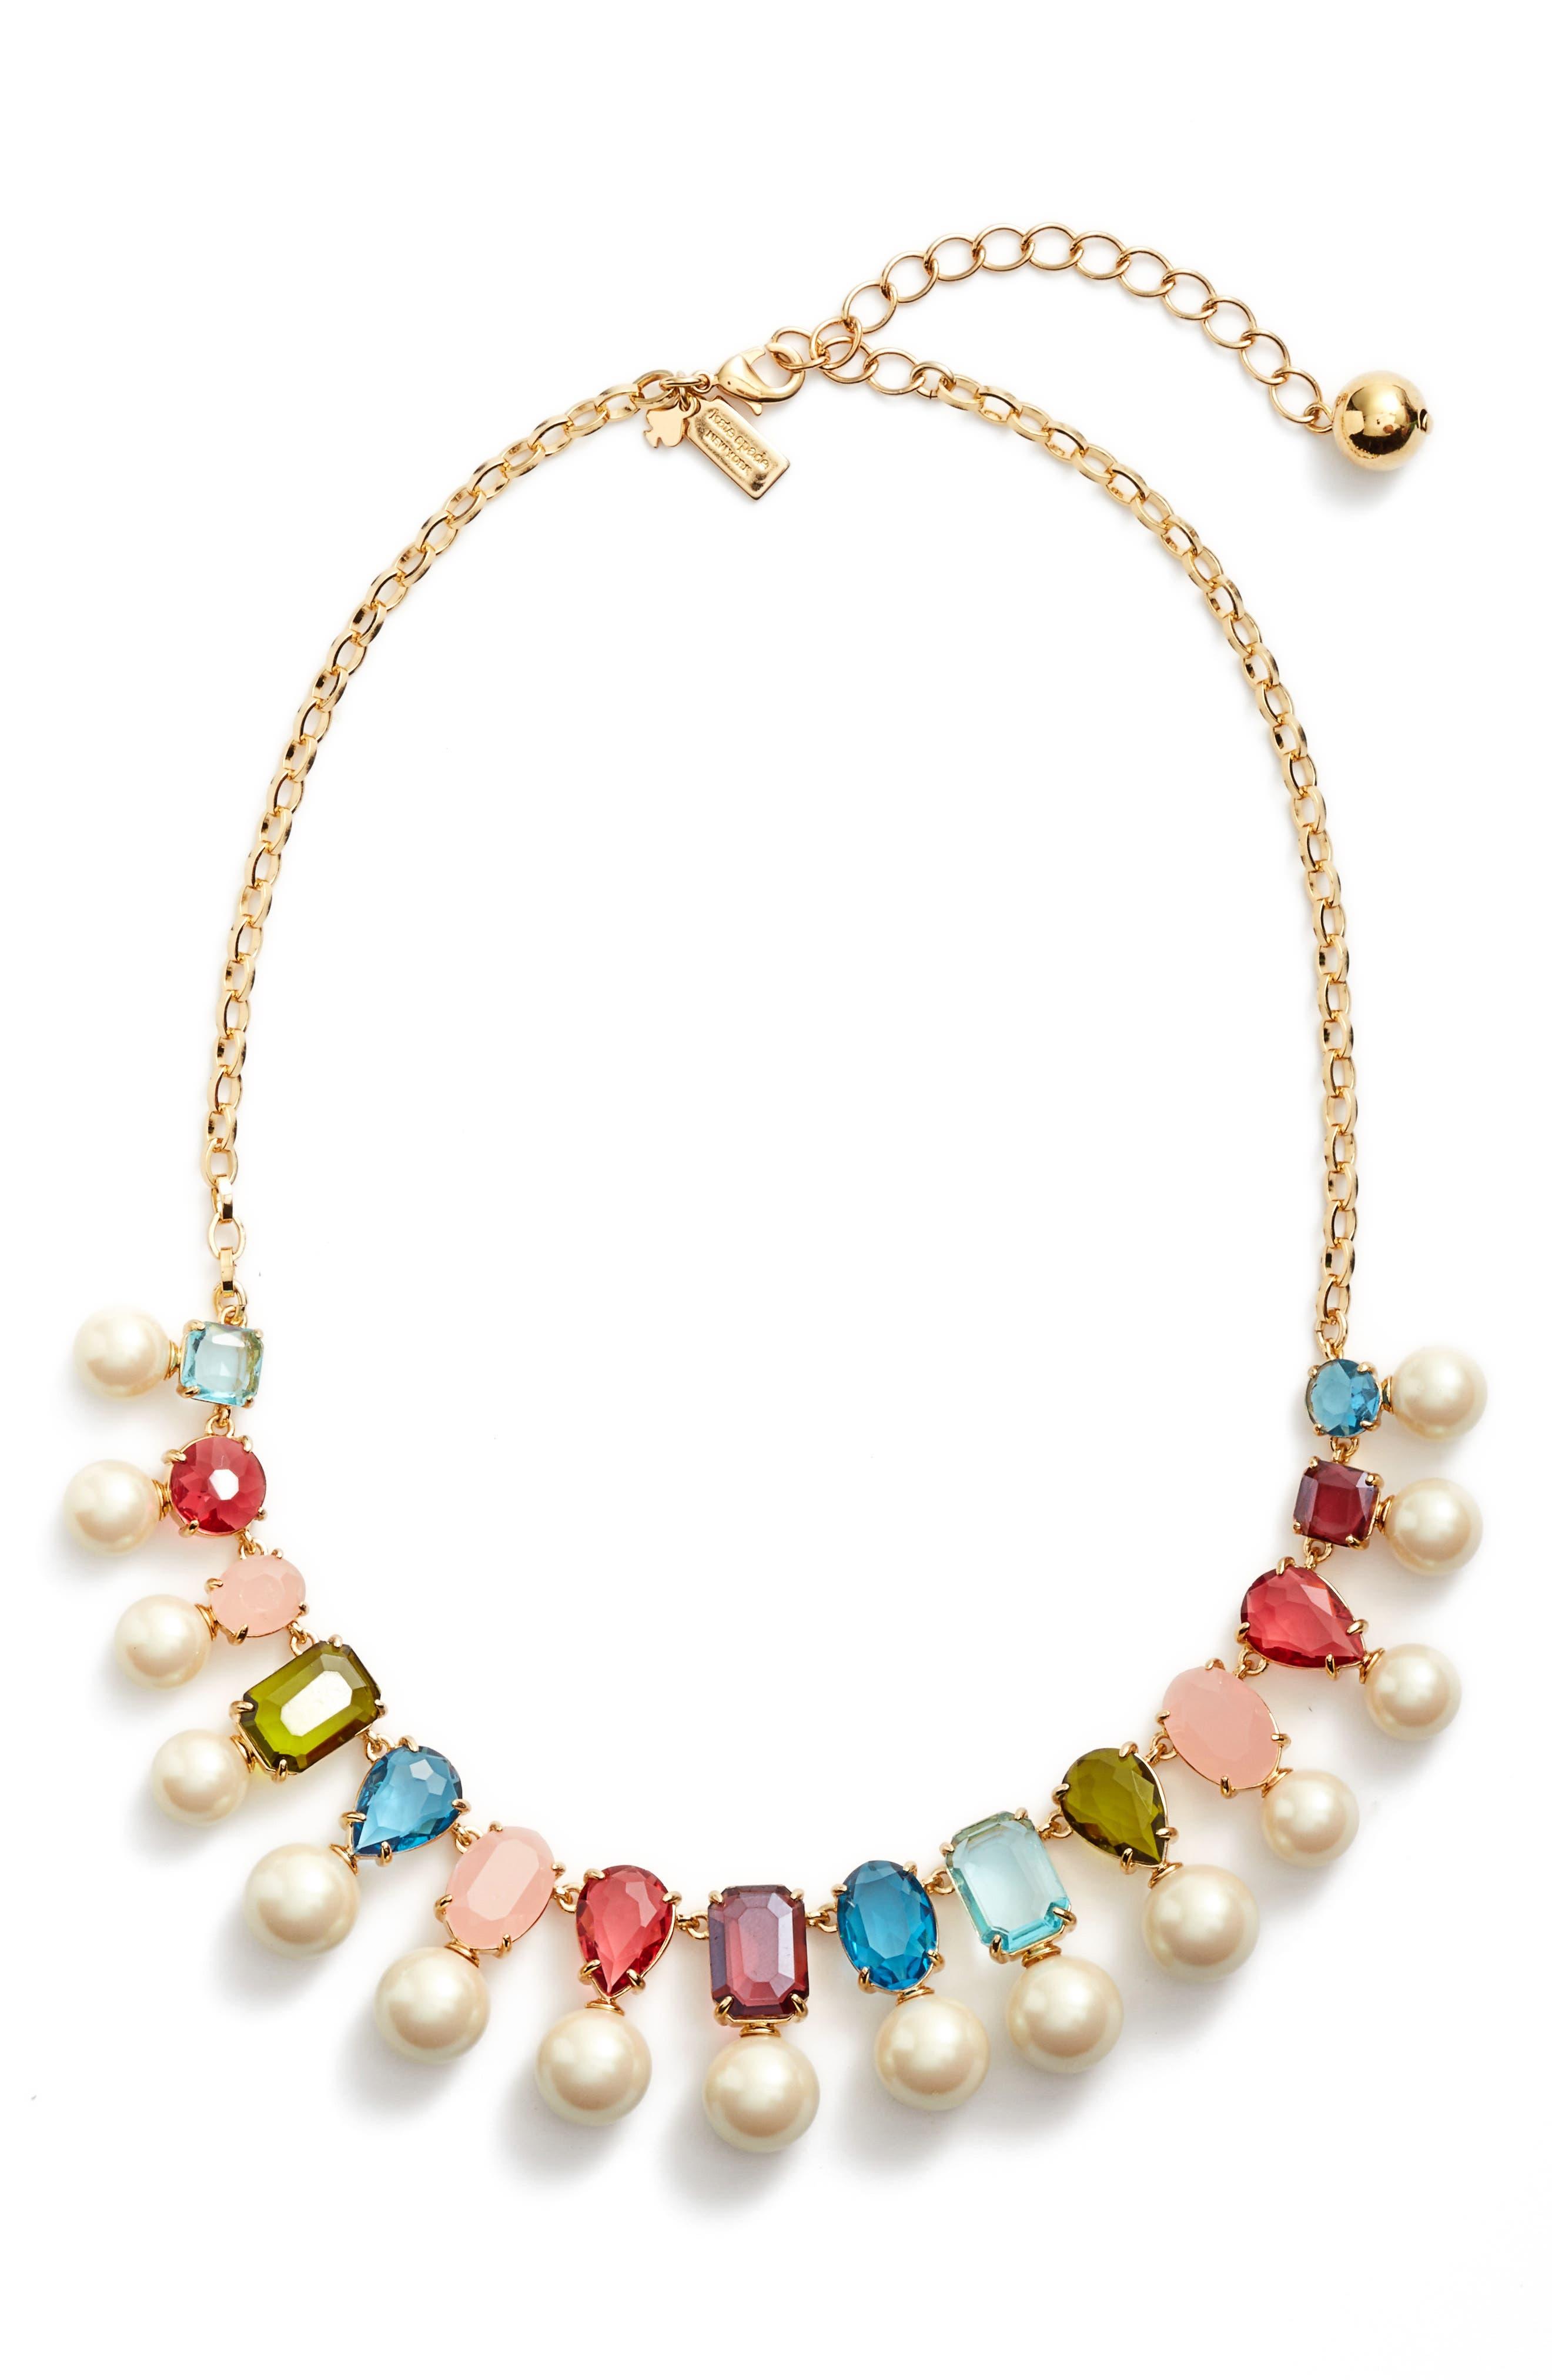 KATE SPADE NEW YORK a new hue collar necklace